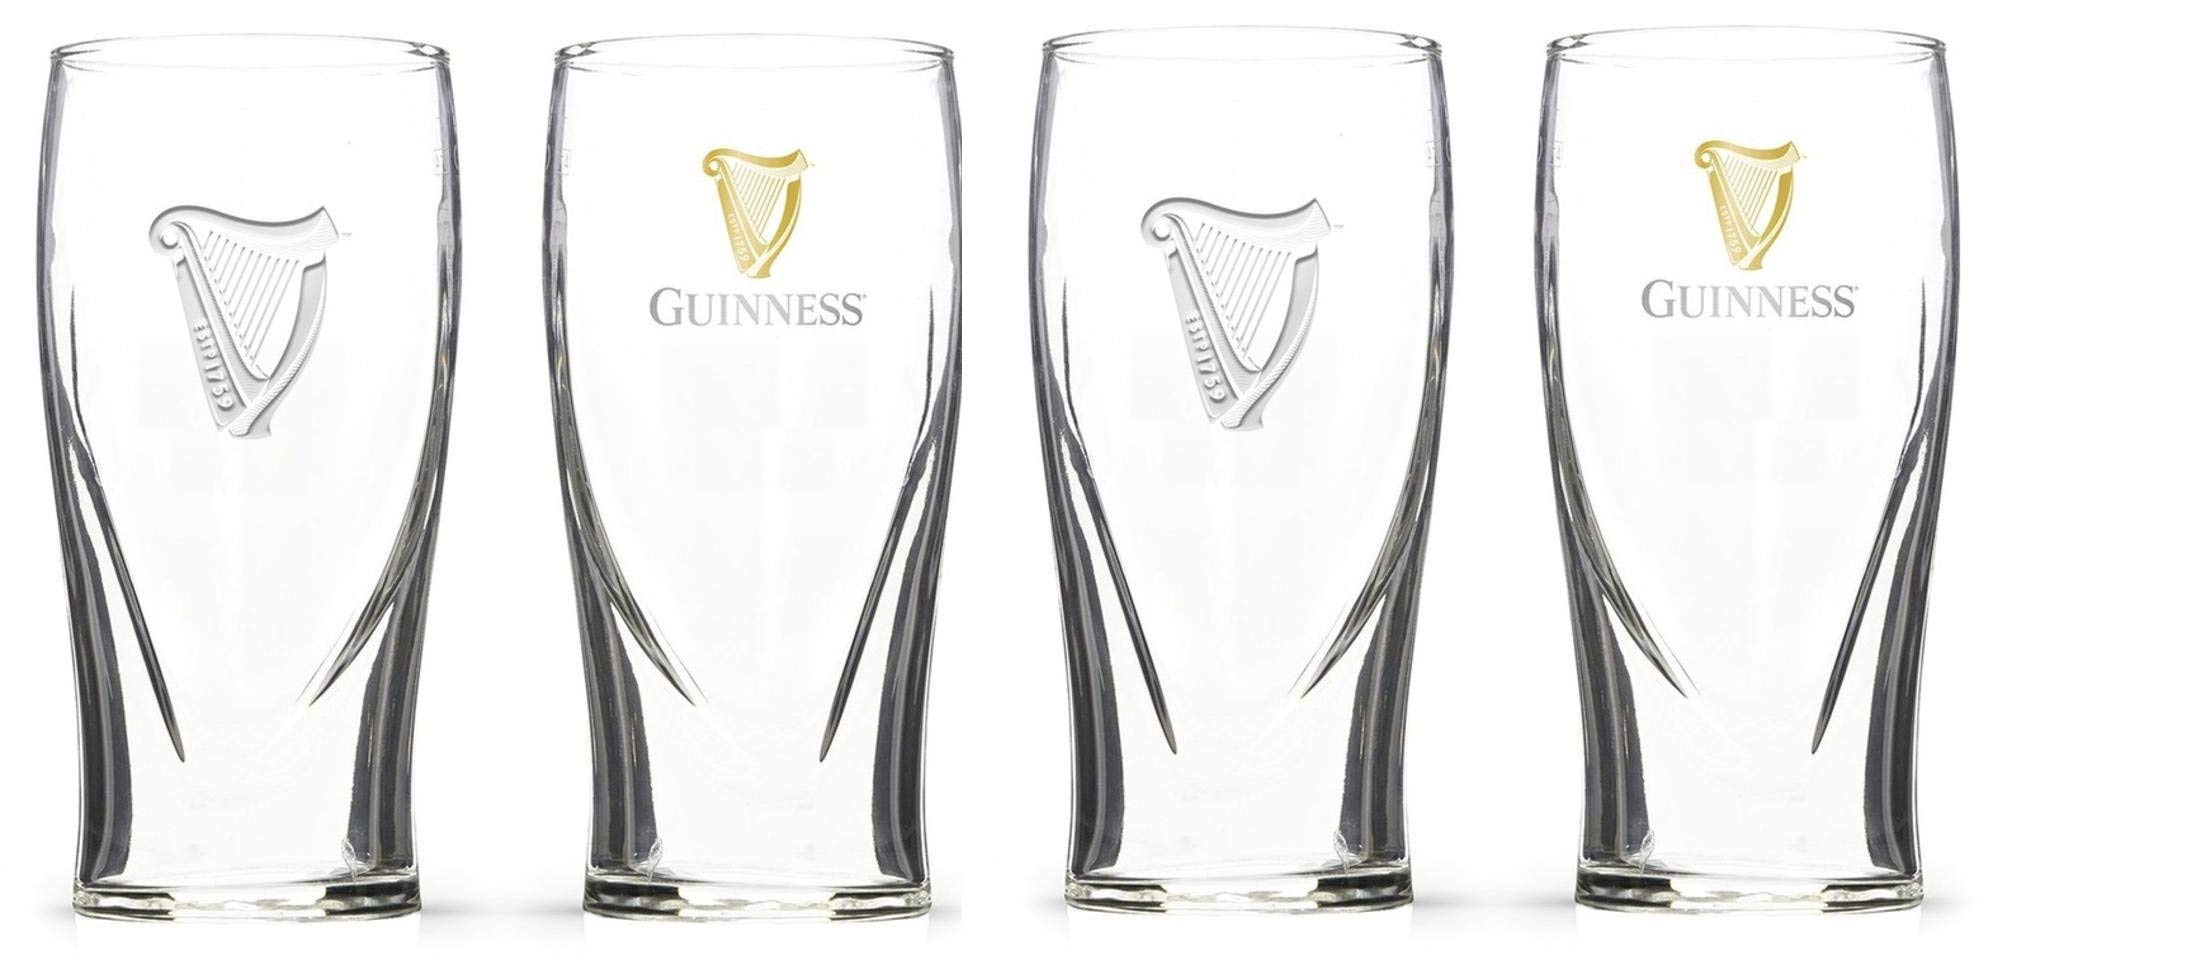 Guinness Irish Pint Beer Glasses 16 Ounce Set of 4